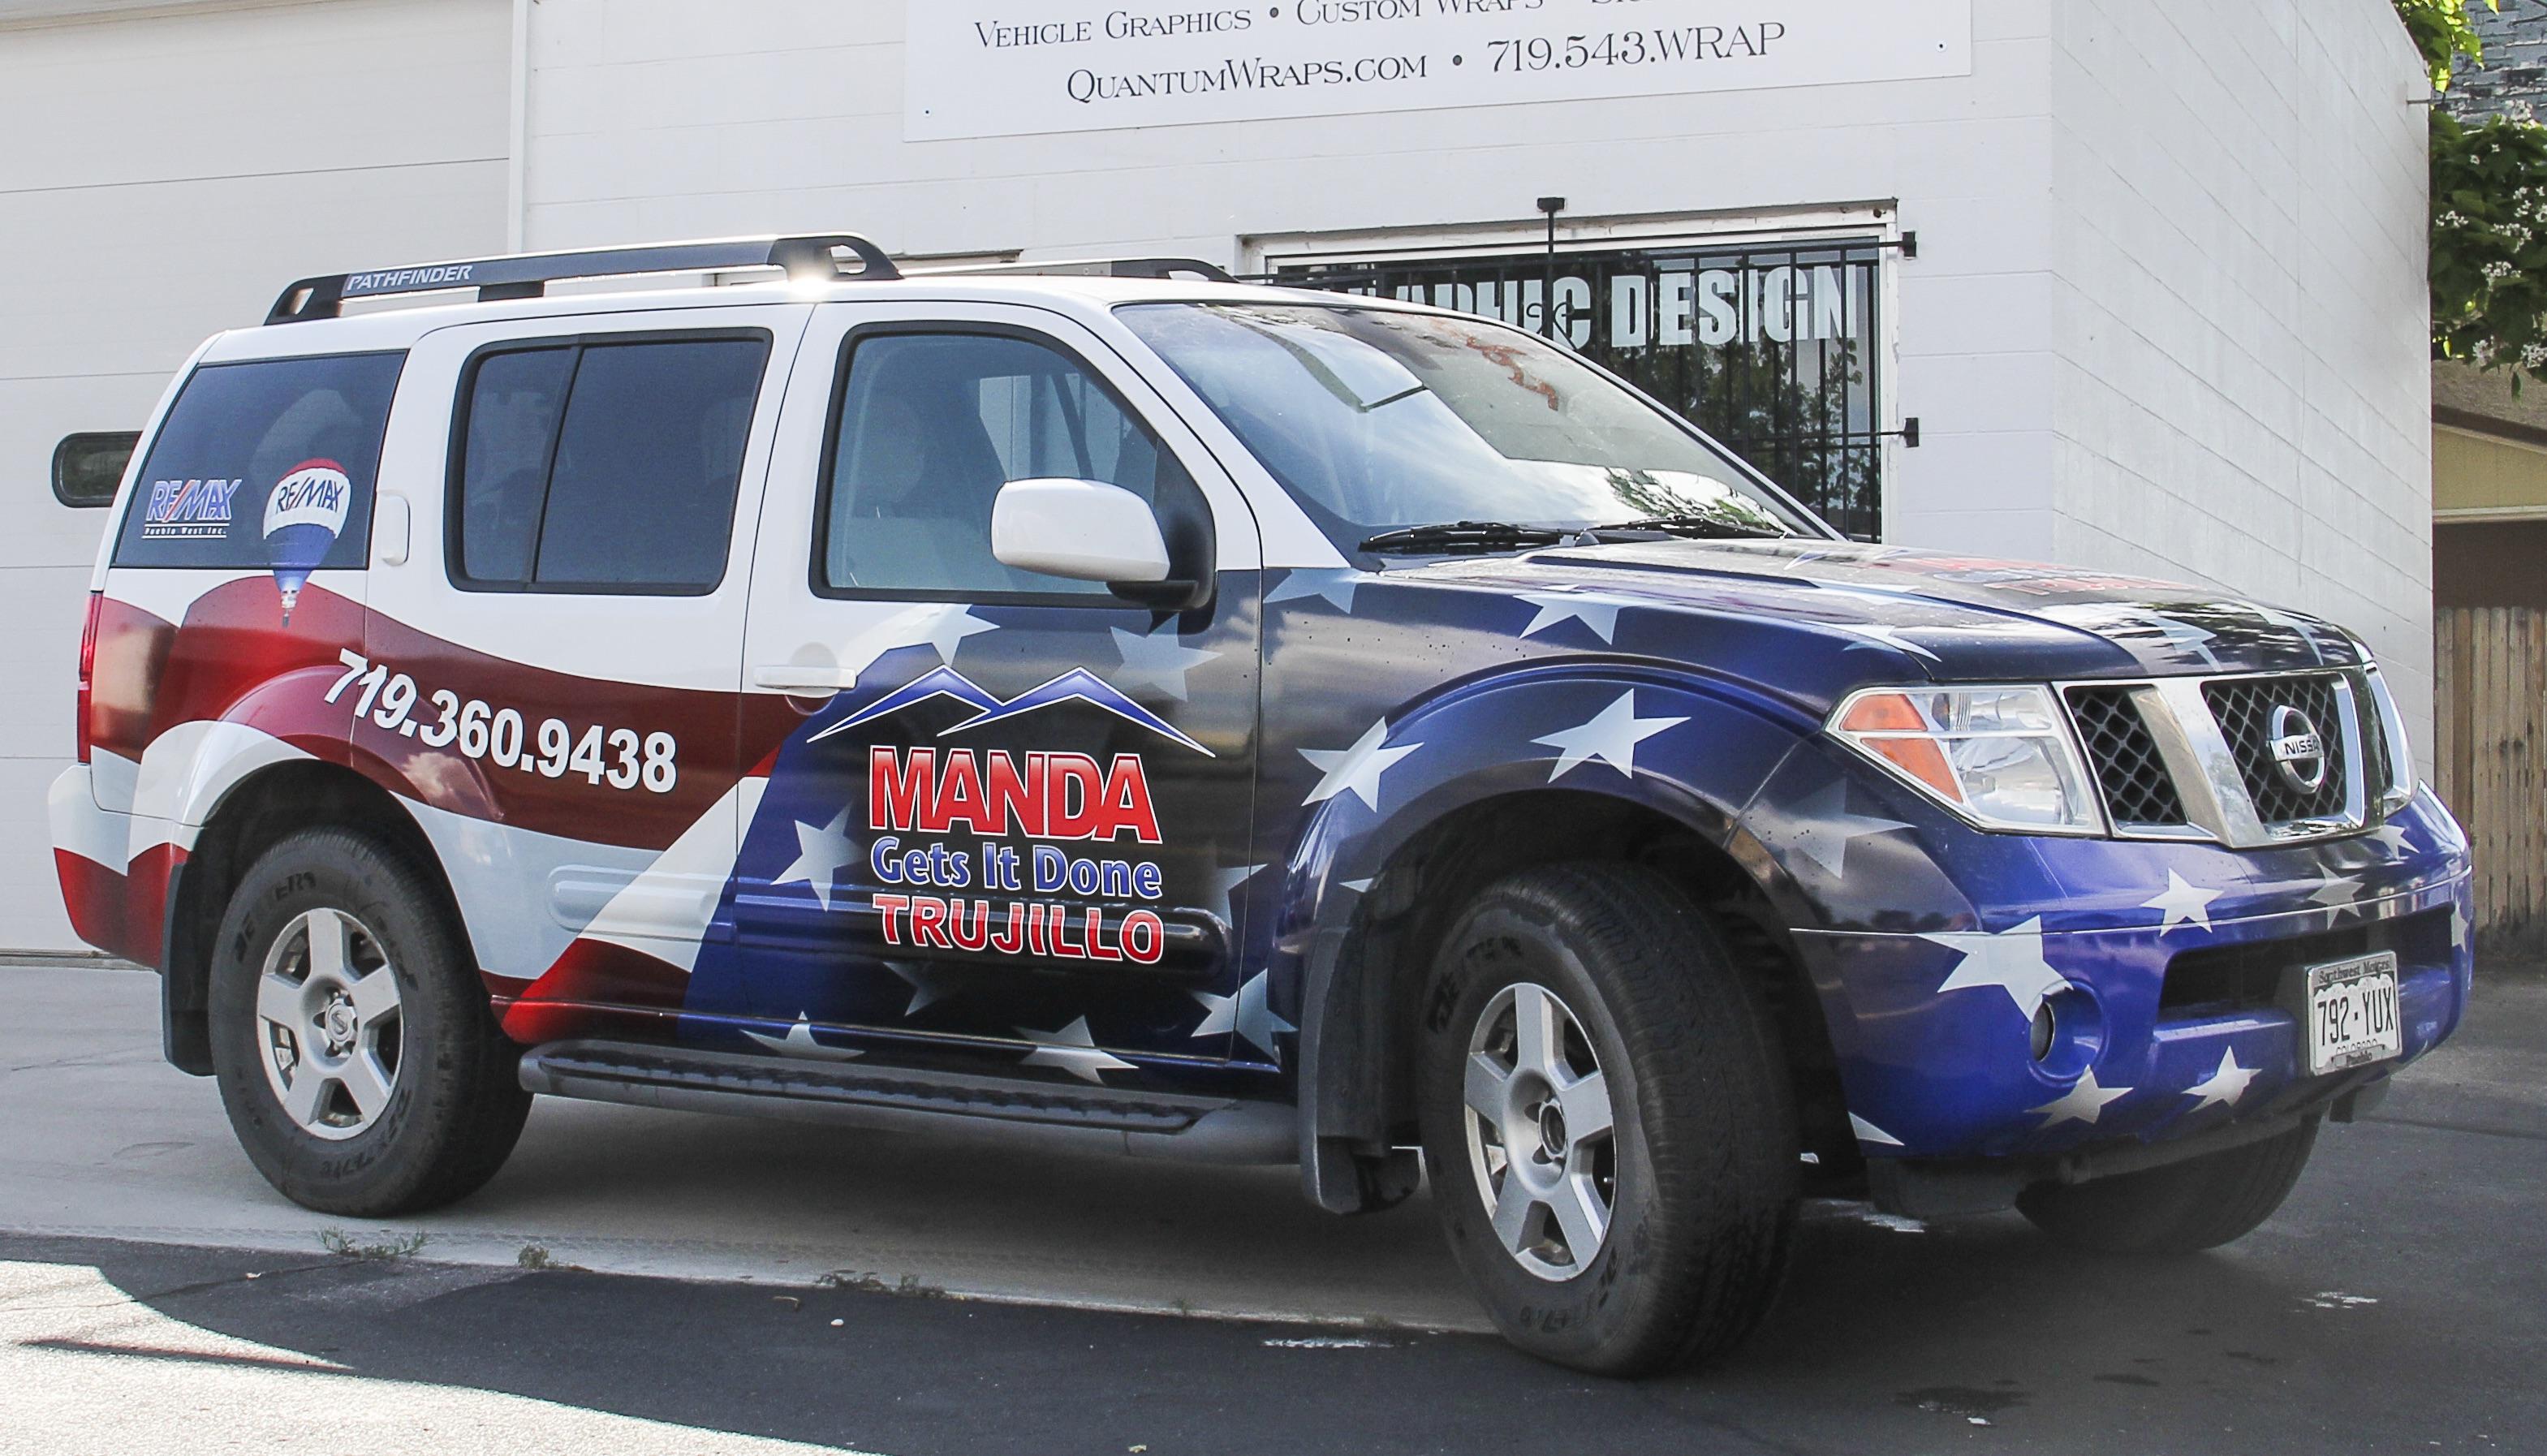 Manda Trujillo Nissan Pathfinder Wra